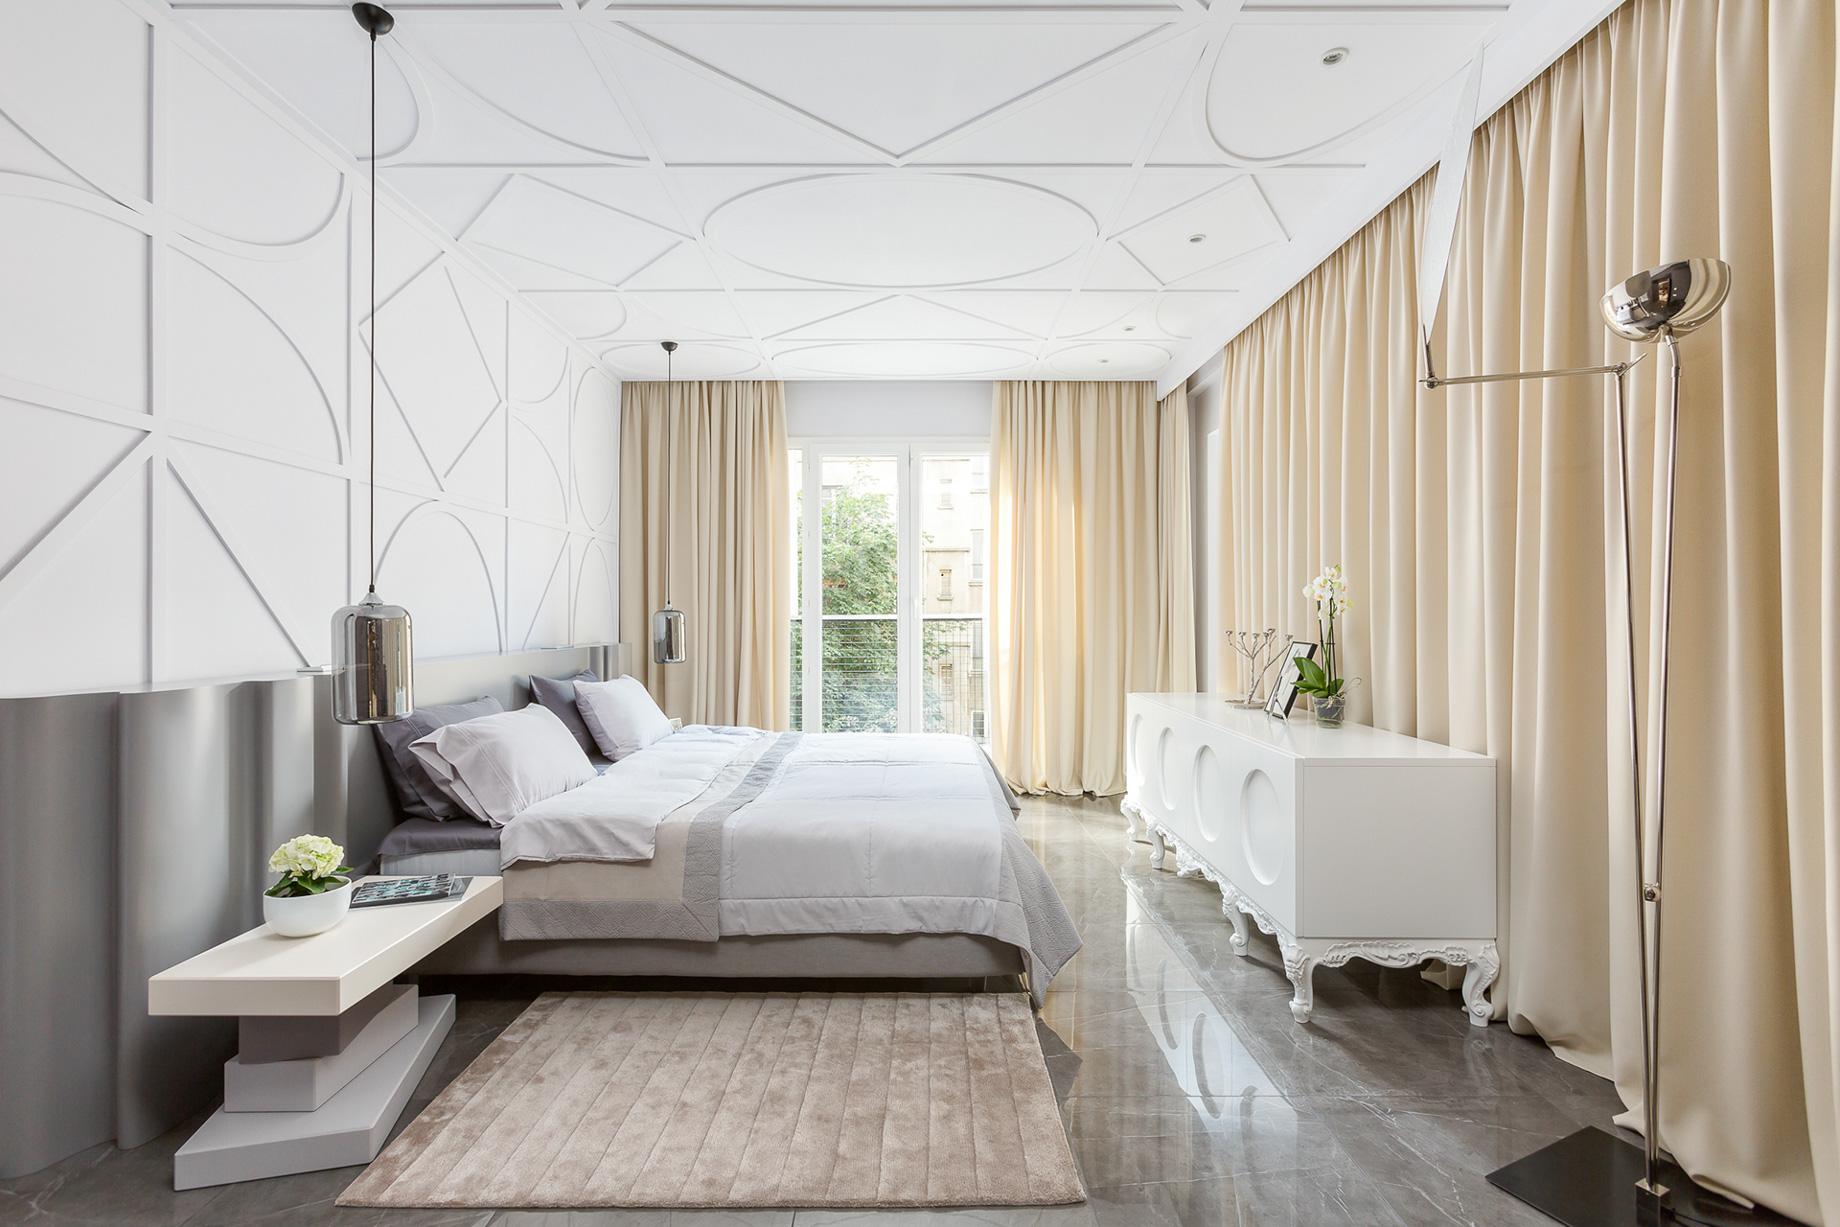 Belle Nouvelle Interior Design Paris, France – Nika Vorotyntseva